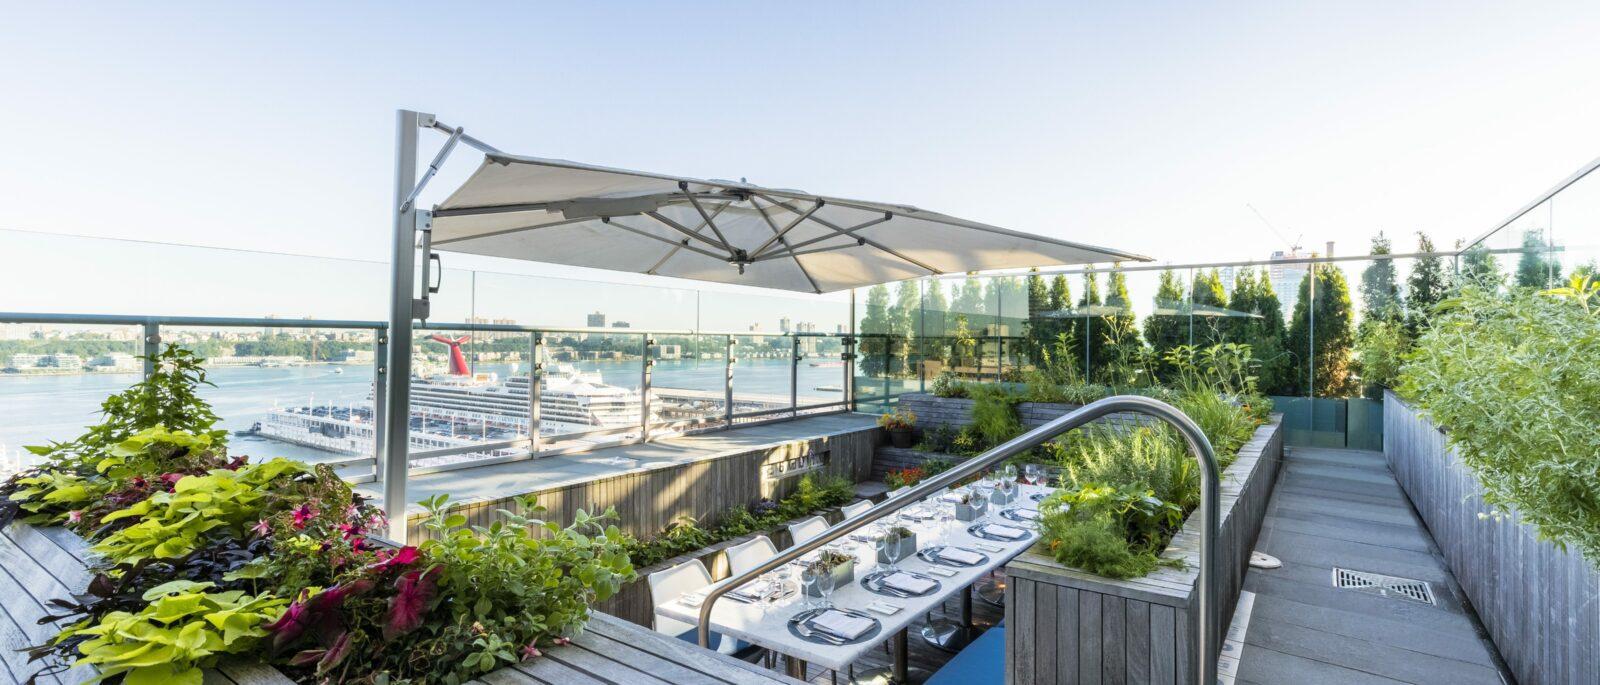 Rooftop garden set for outdoor dining.